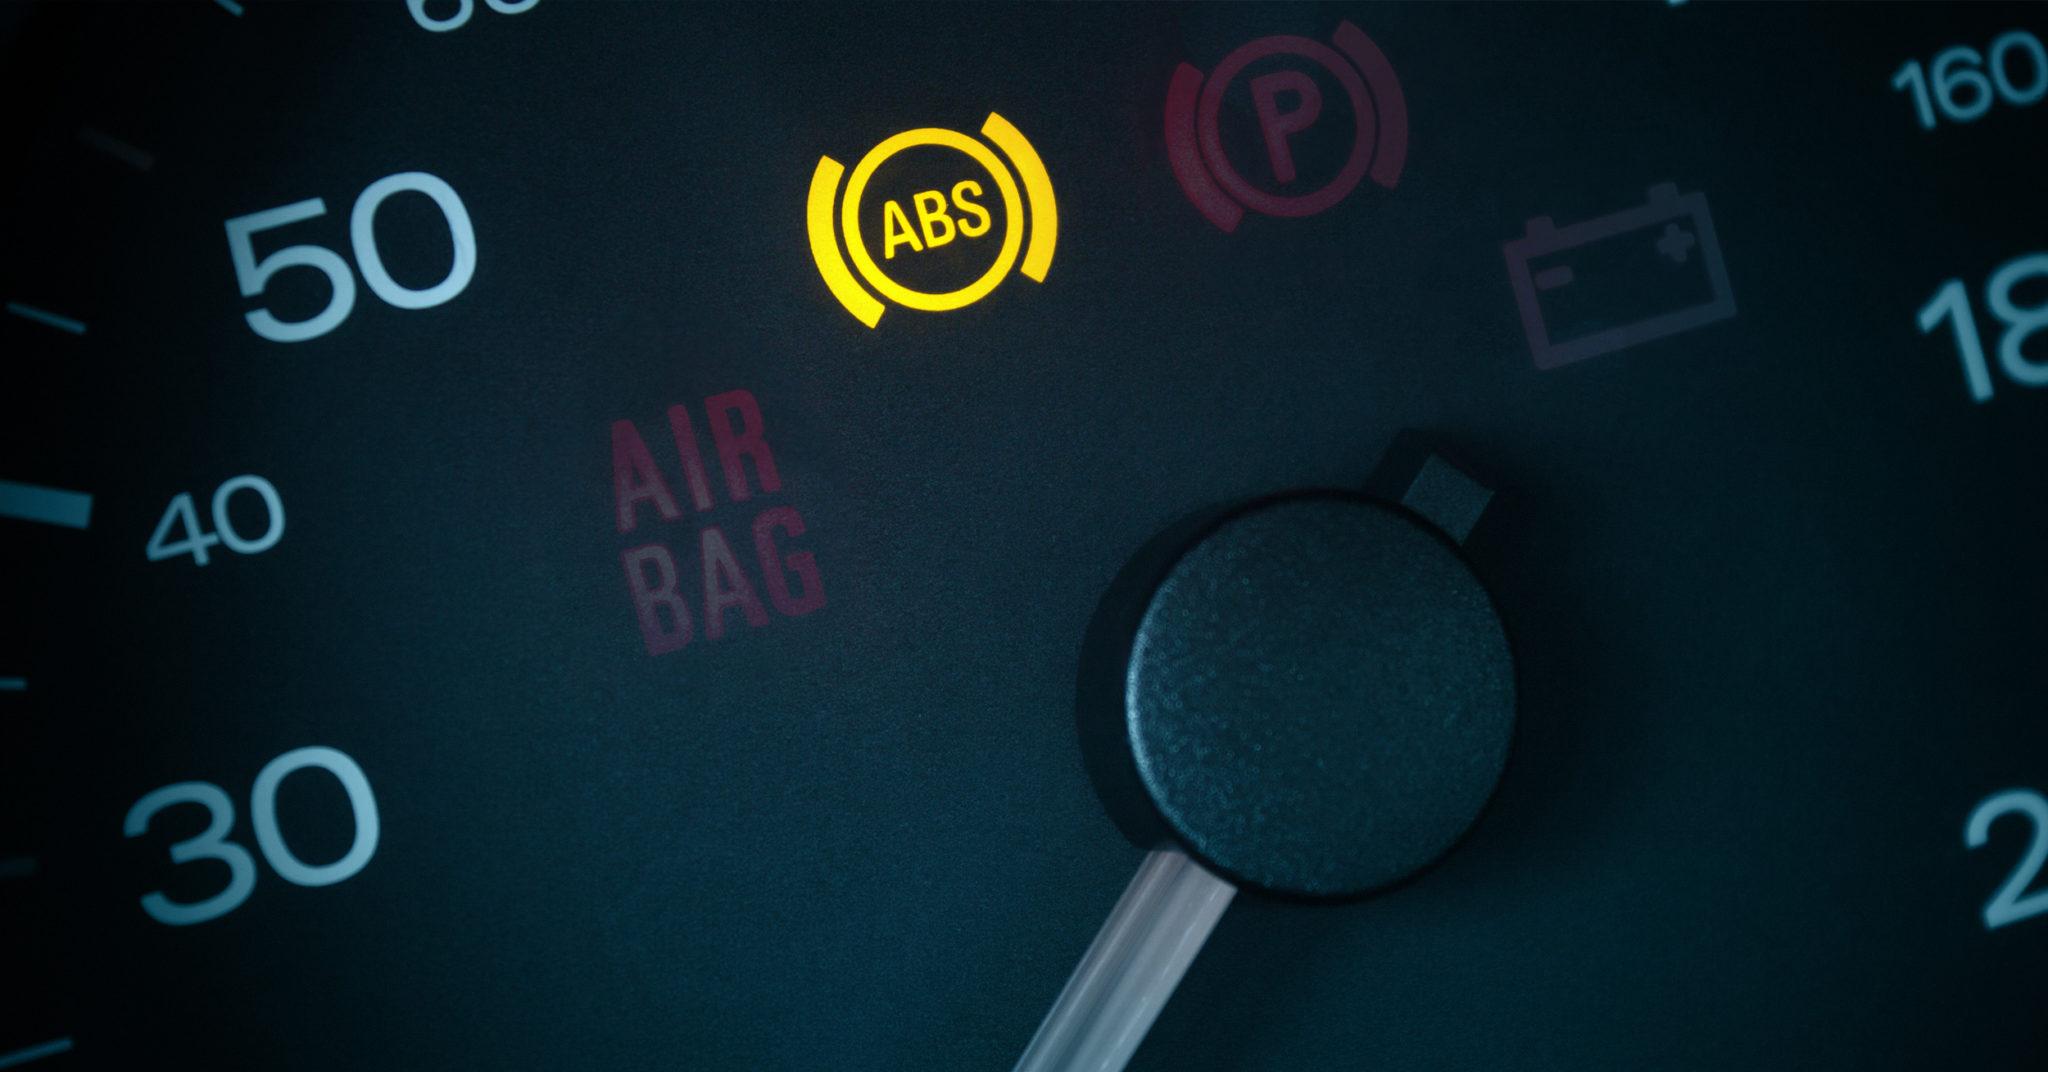 New ABS Sensors